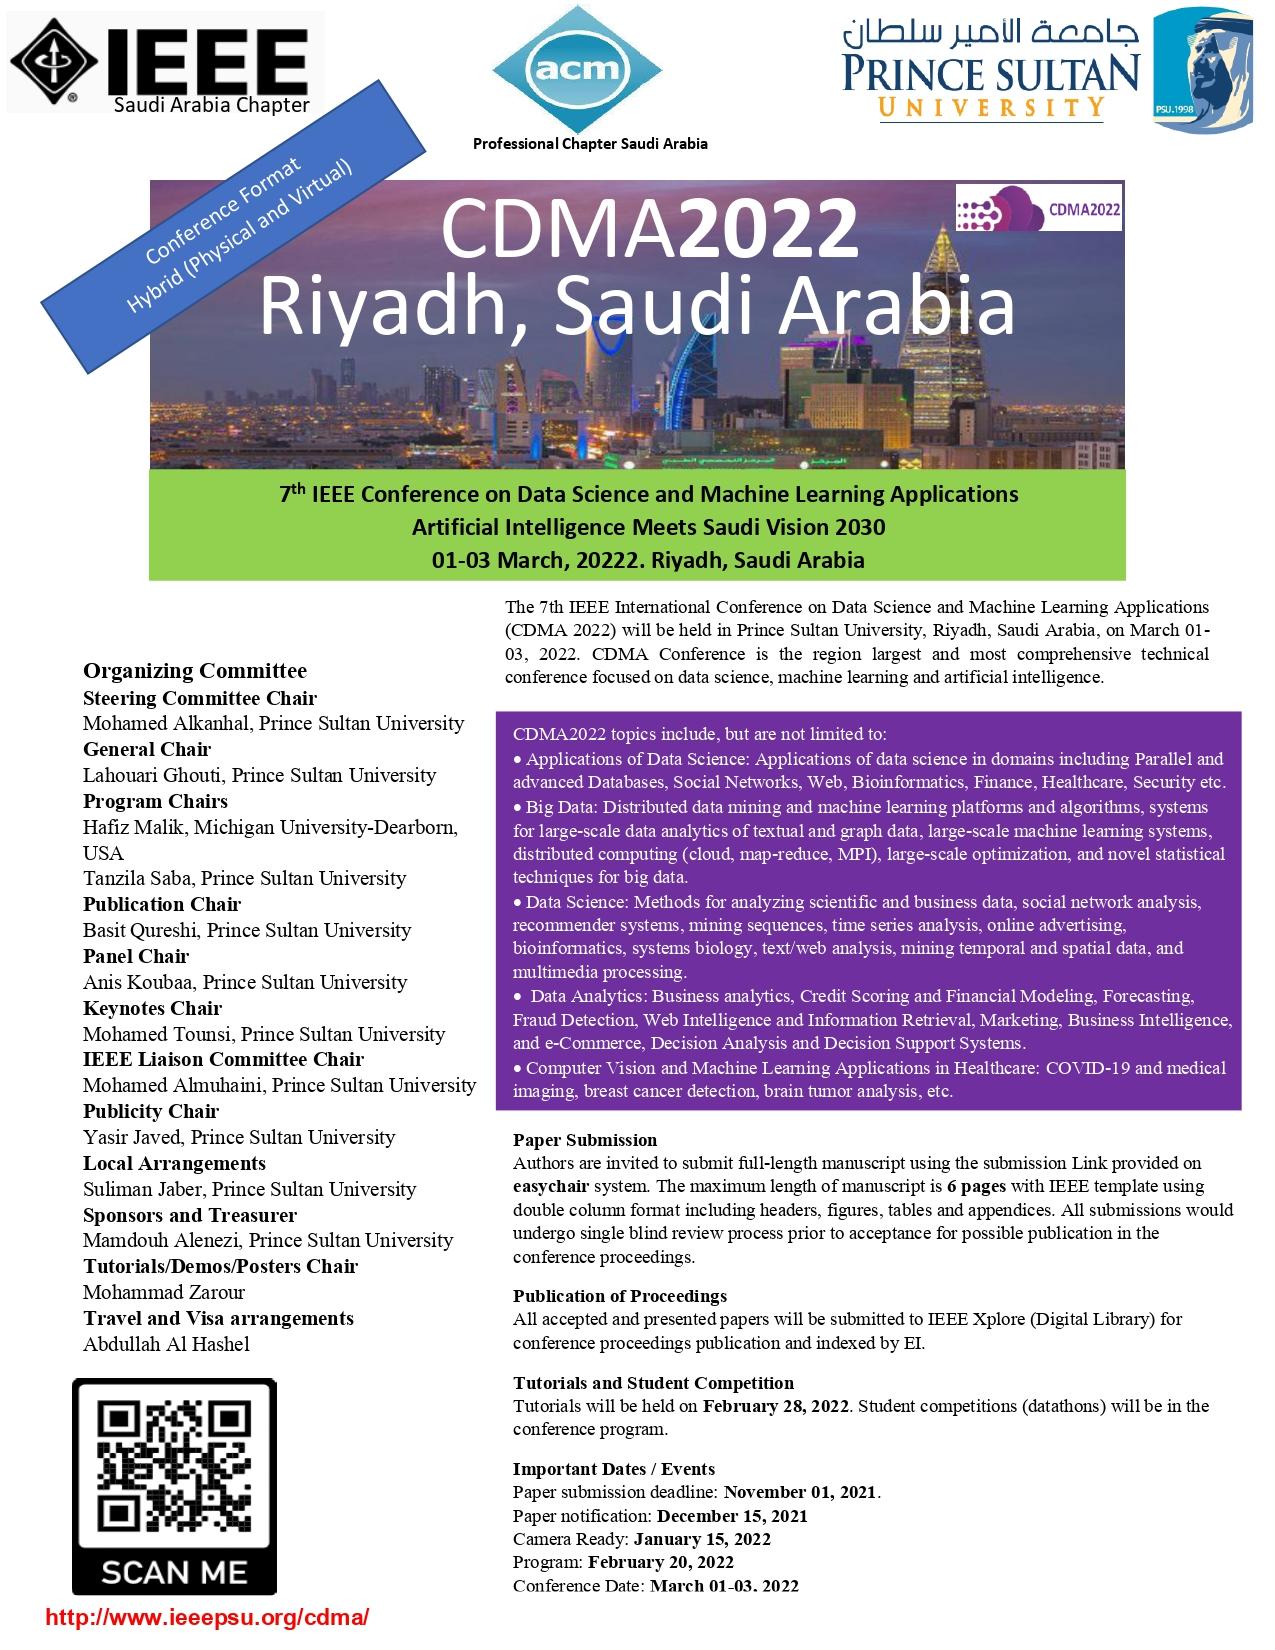 CDMA 2022 Dates announced